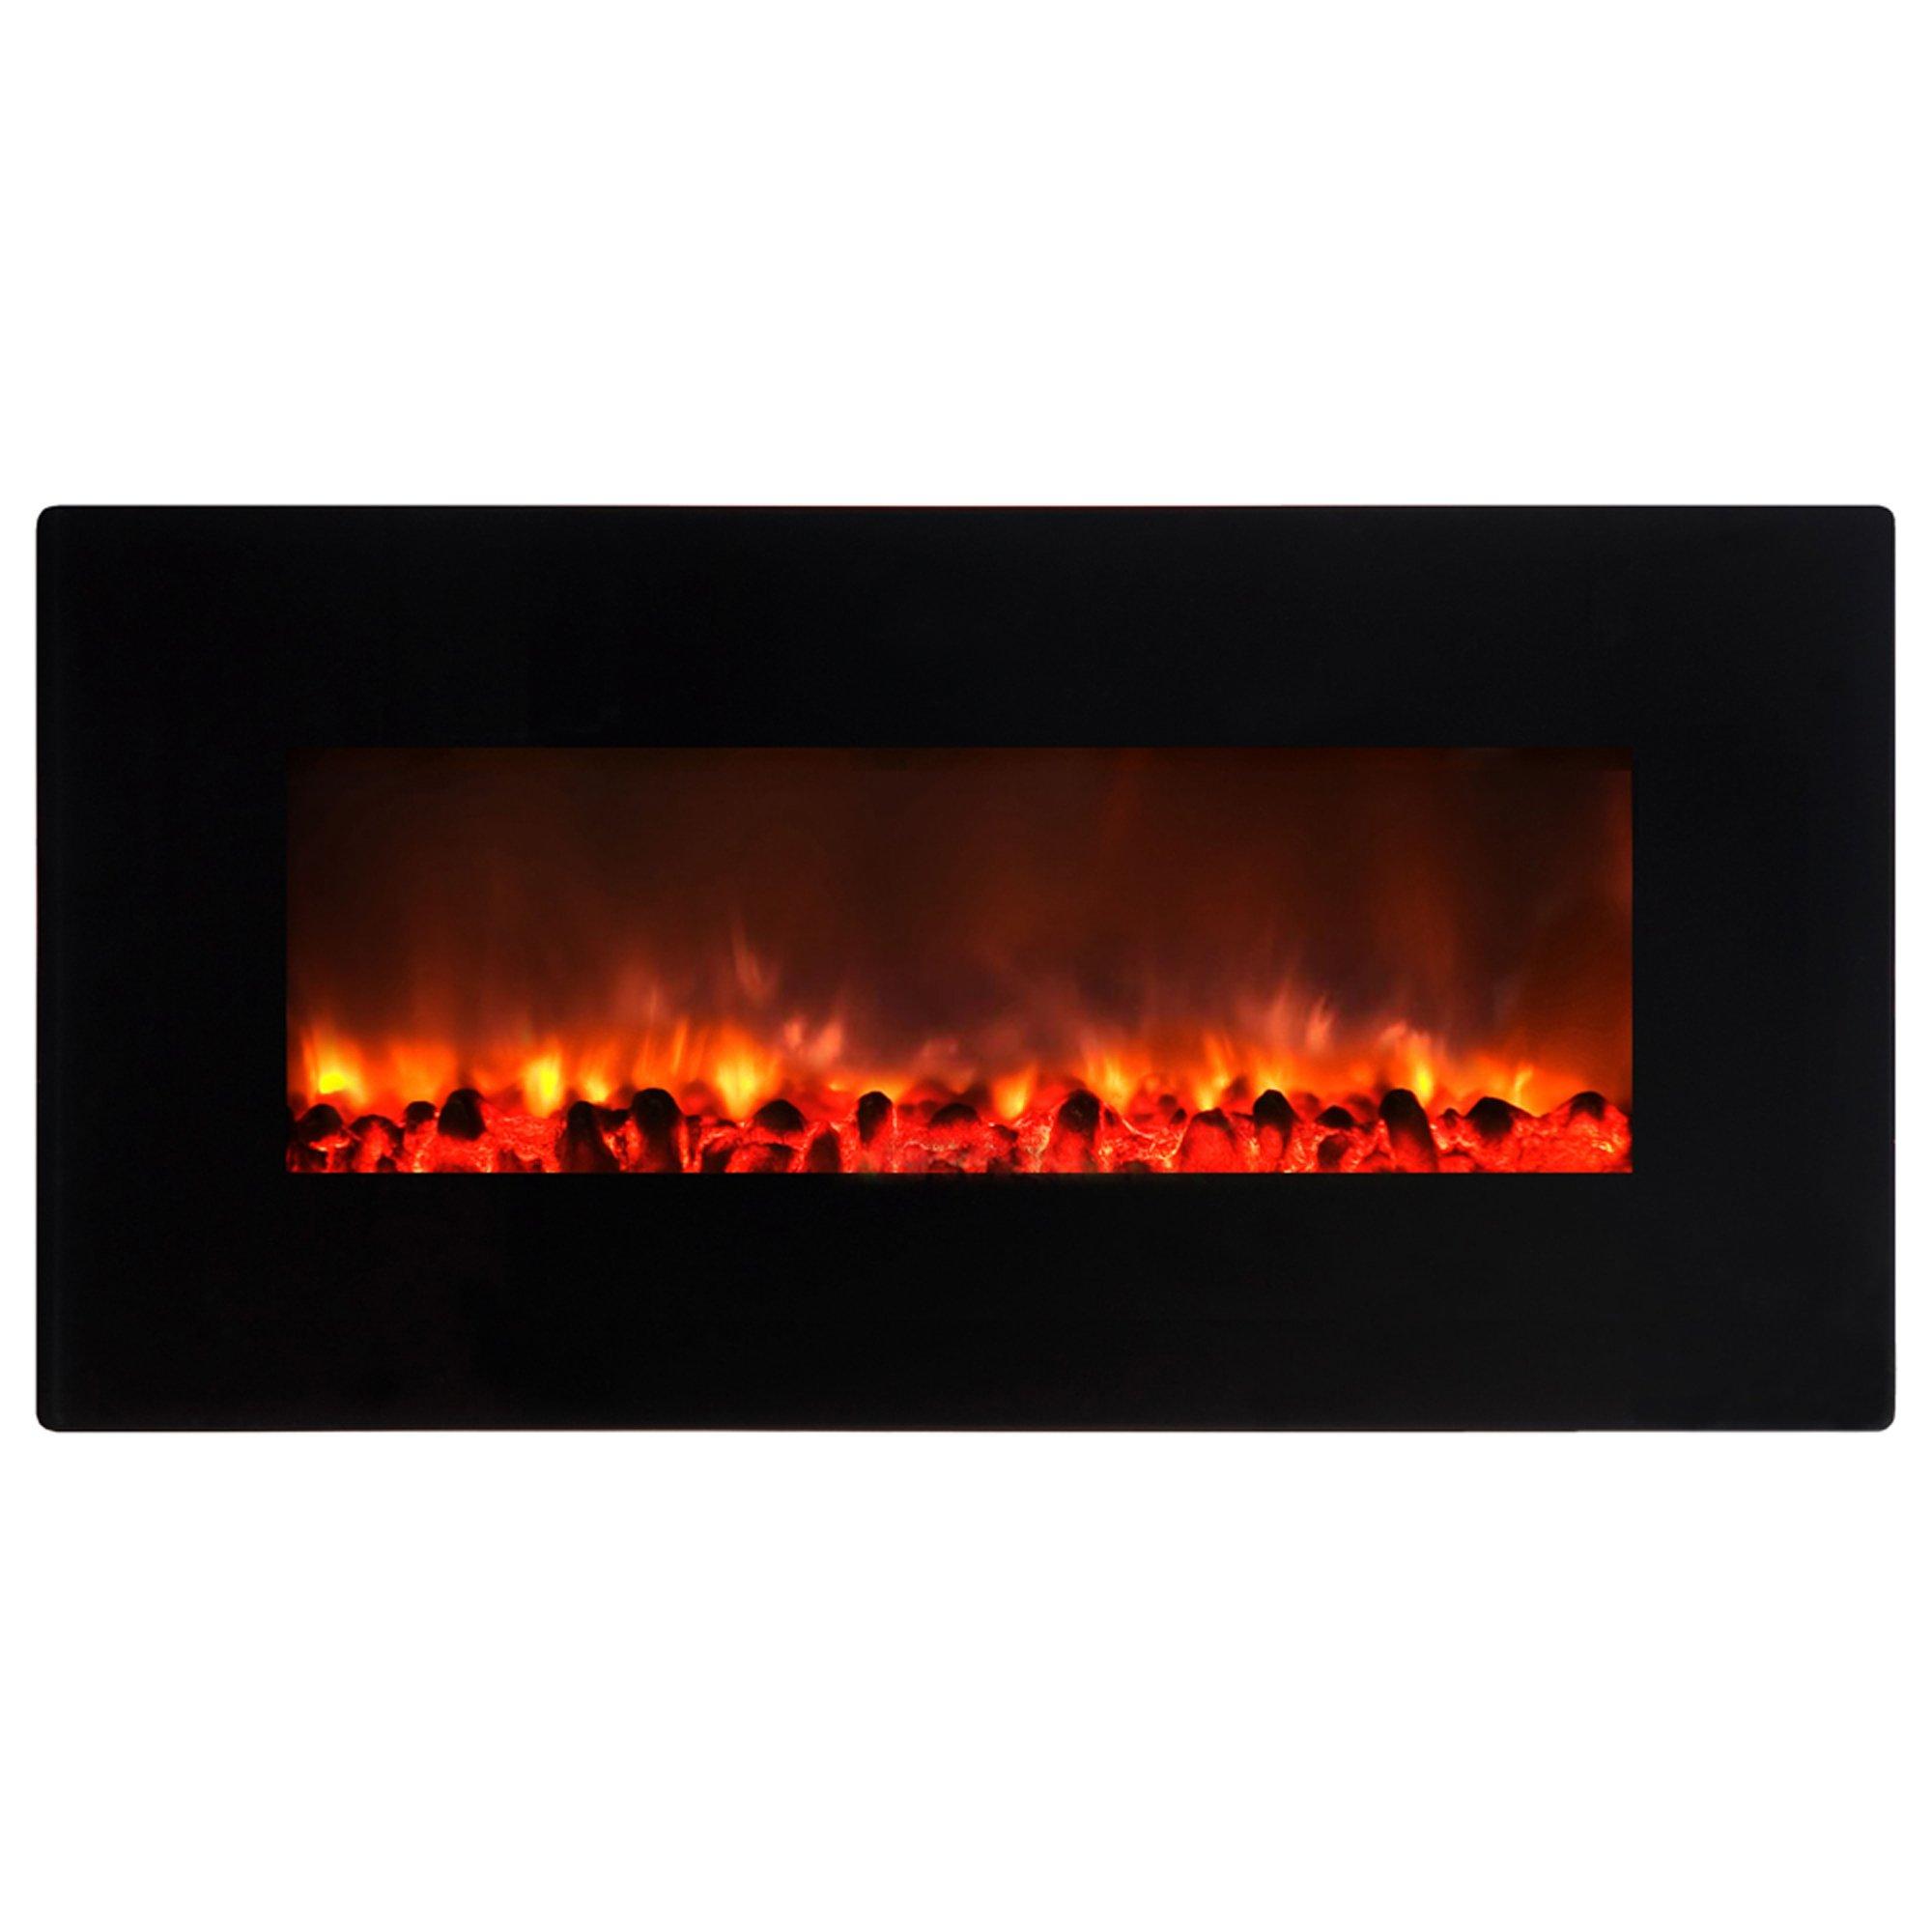 Yosemite Home Decor DF-EFP900 Small Glass Wall Hang Electric Fireplace, Black Gloss